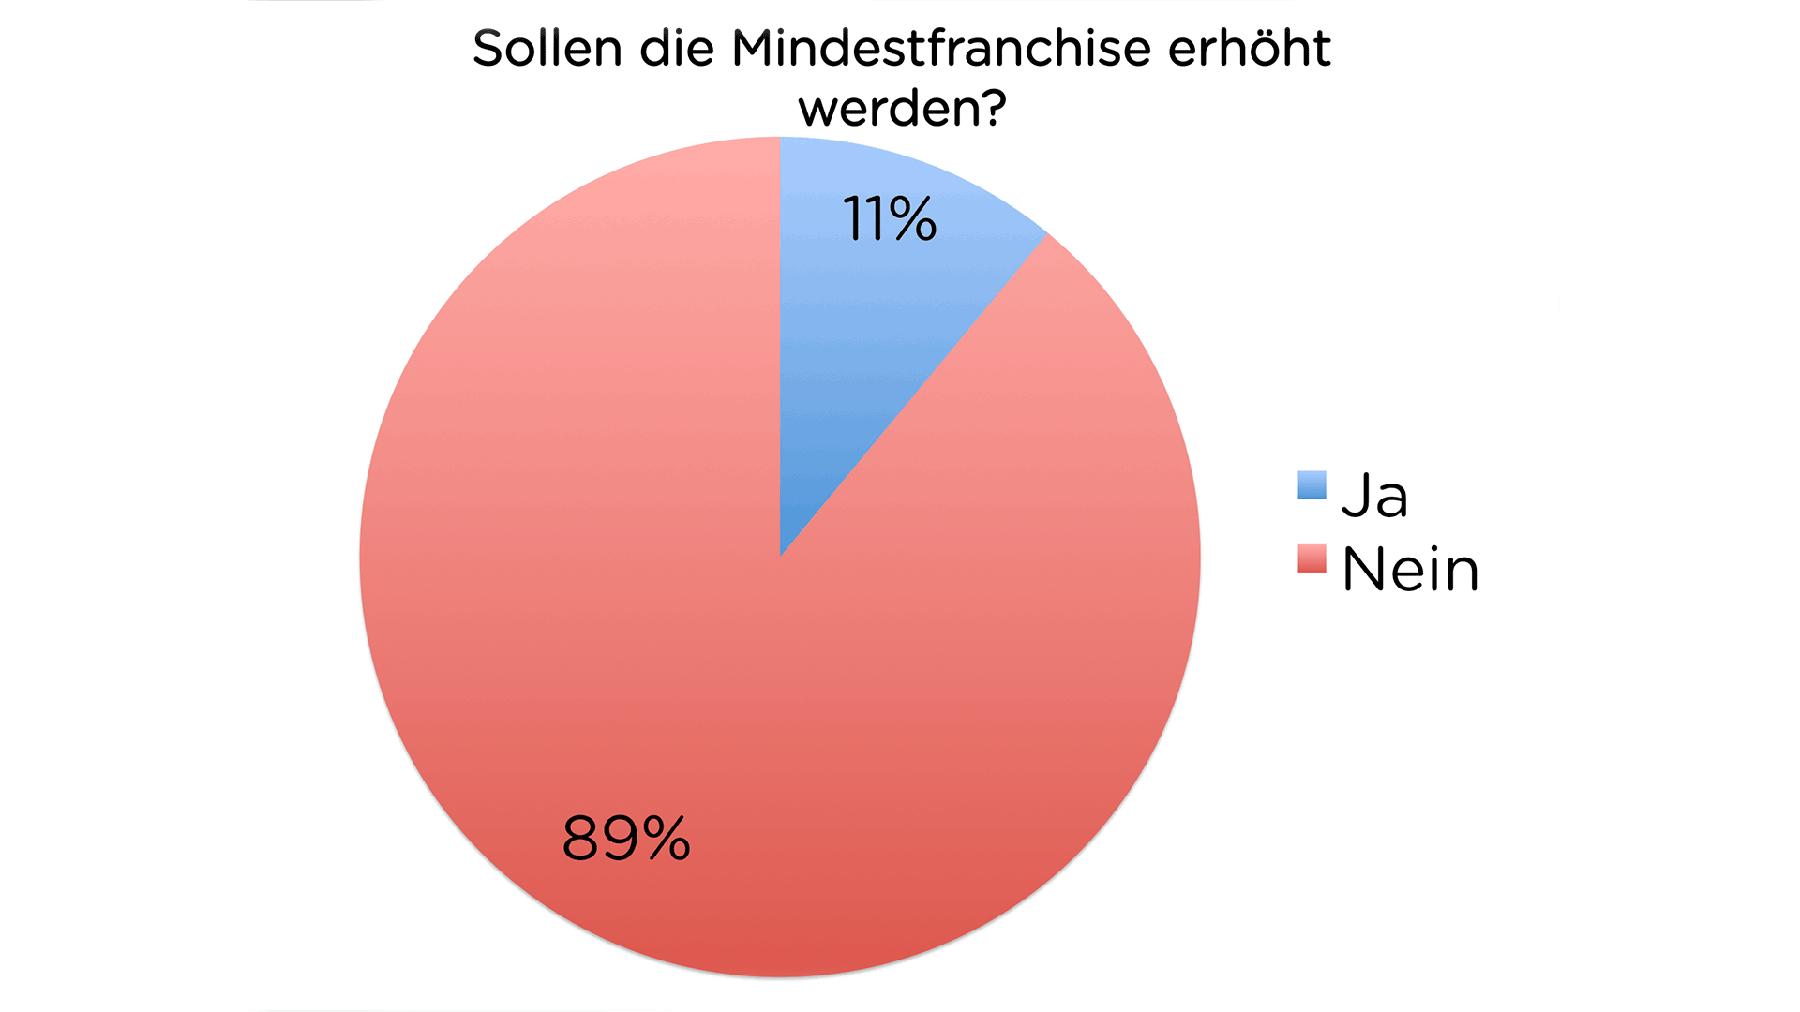 TalkTaeglich-Umfrage: Mindestfranchise